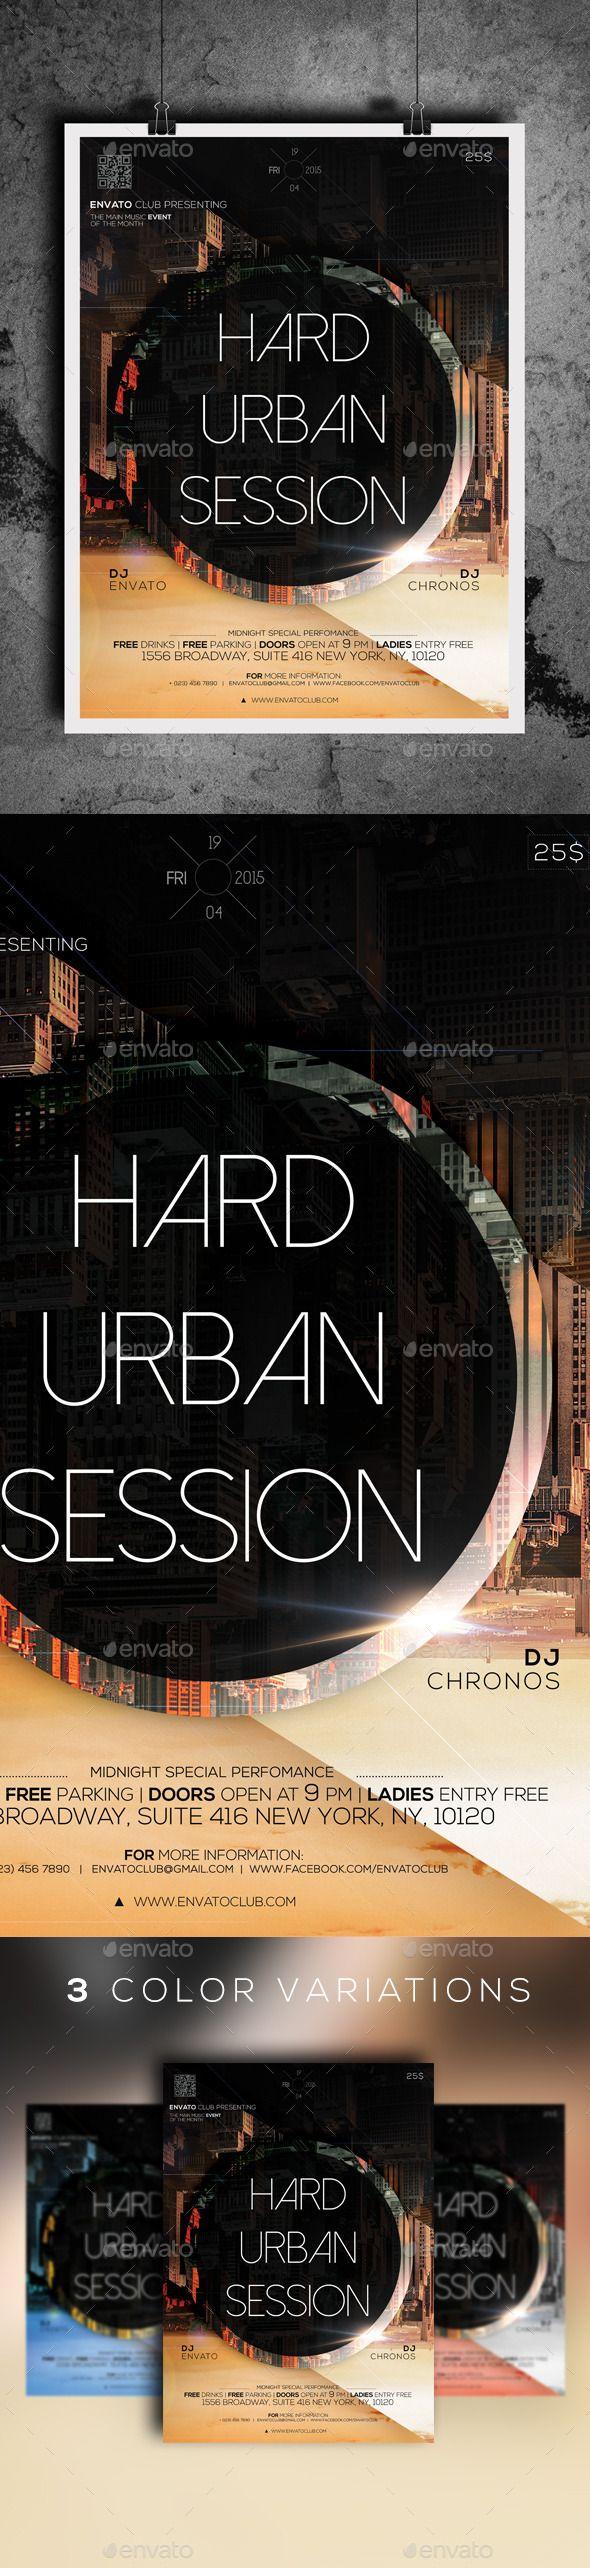 Hard Urban Session (CS, 8.5x11.9, club, dark, dnb, drum & bass, drum and bass, dubstep, electronic, festival, flyer, futuristic, minimal, music, neurofunk, party, party flyer, poster, print, shooter, template, urban)